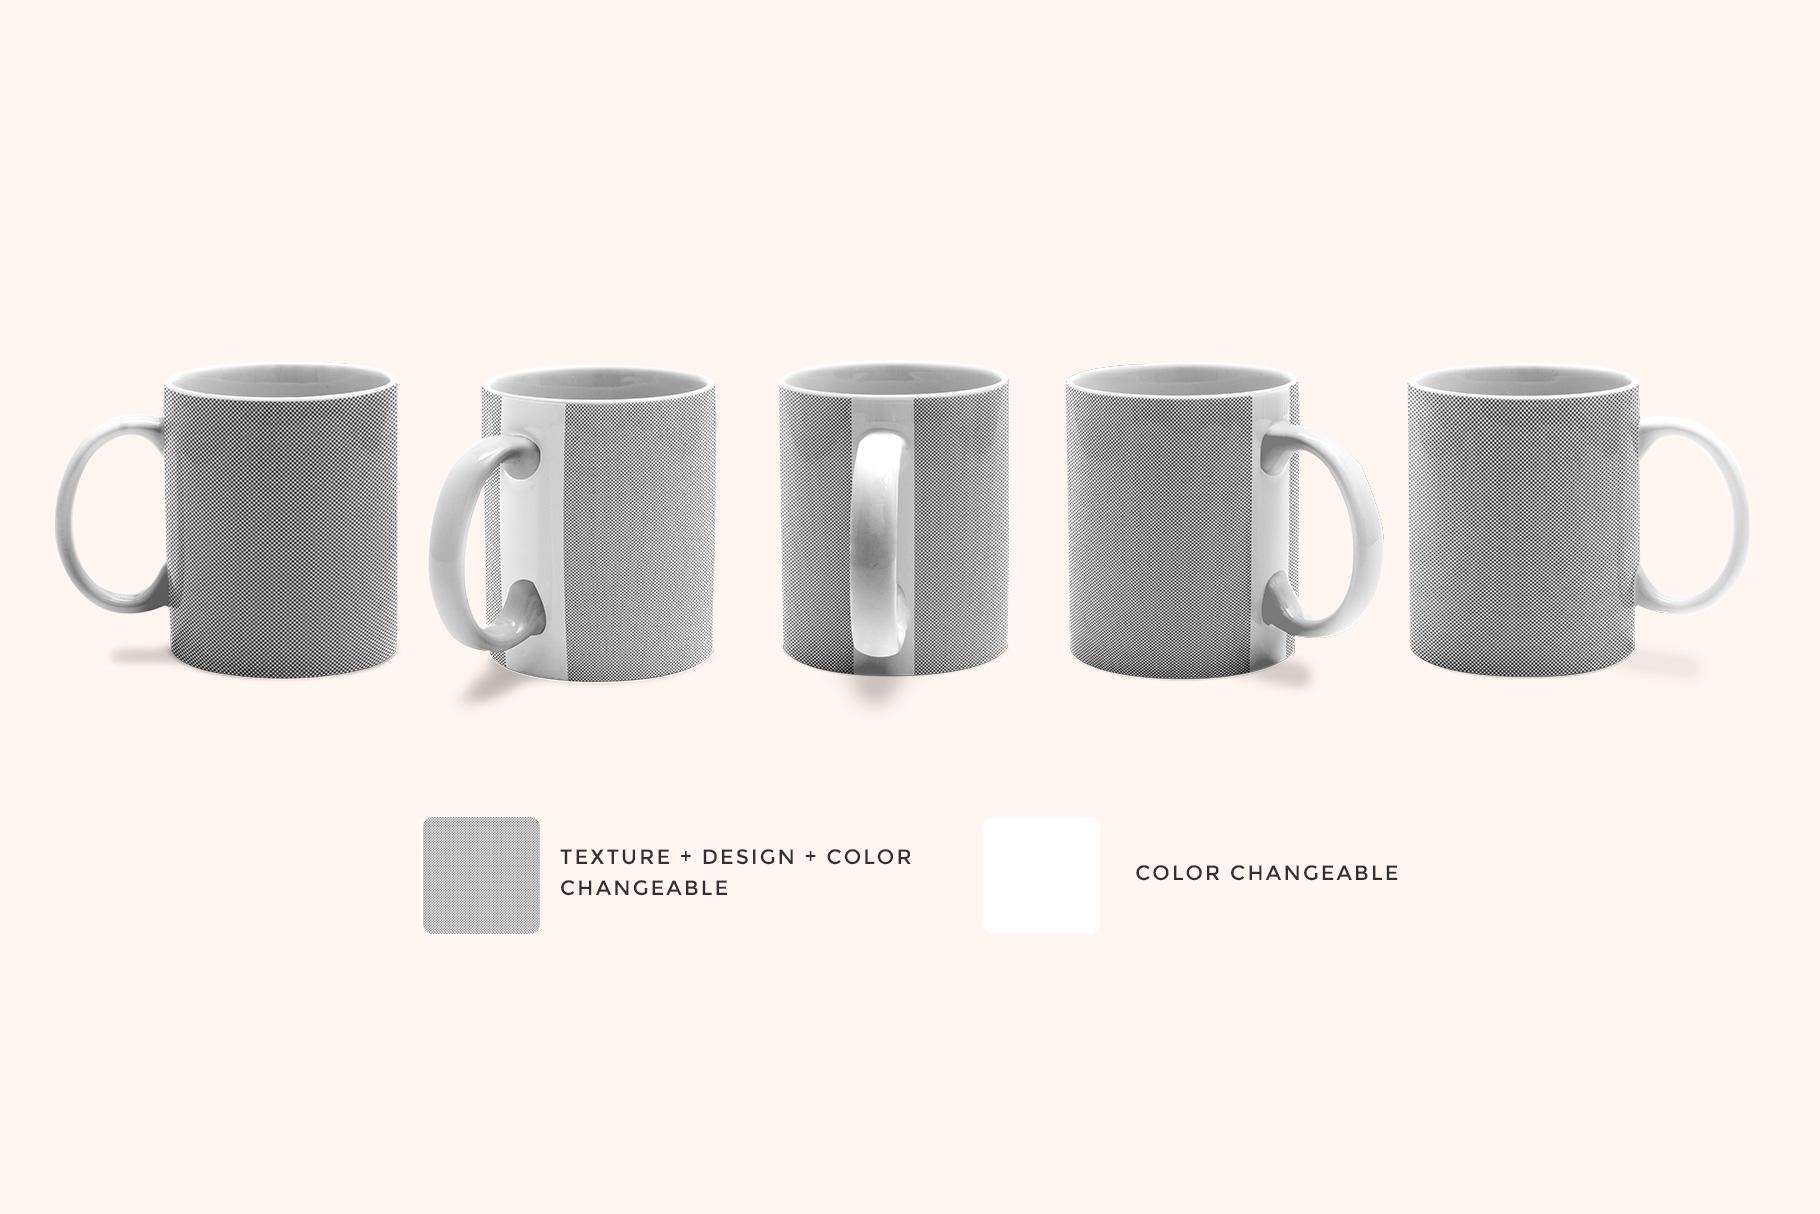 editability of the ceramic coffee mugs mockup set